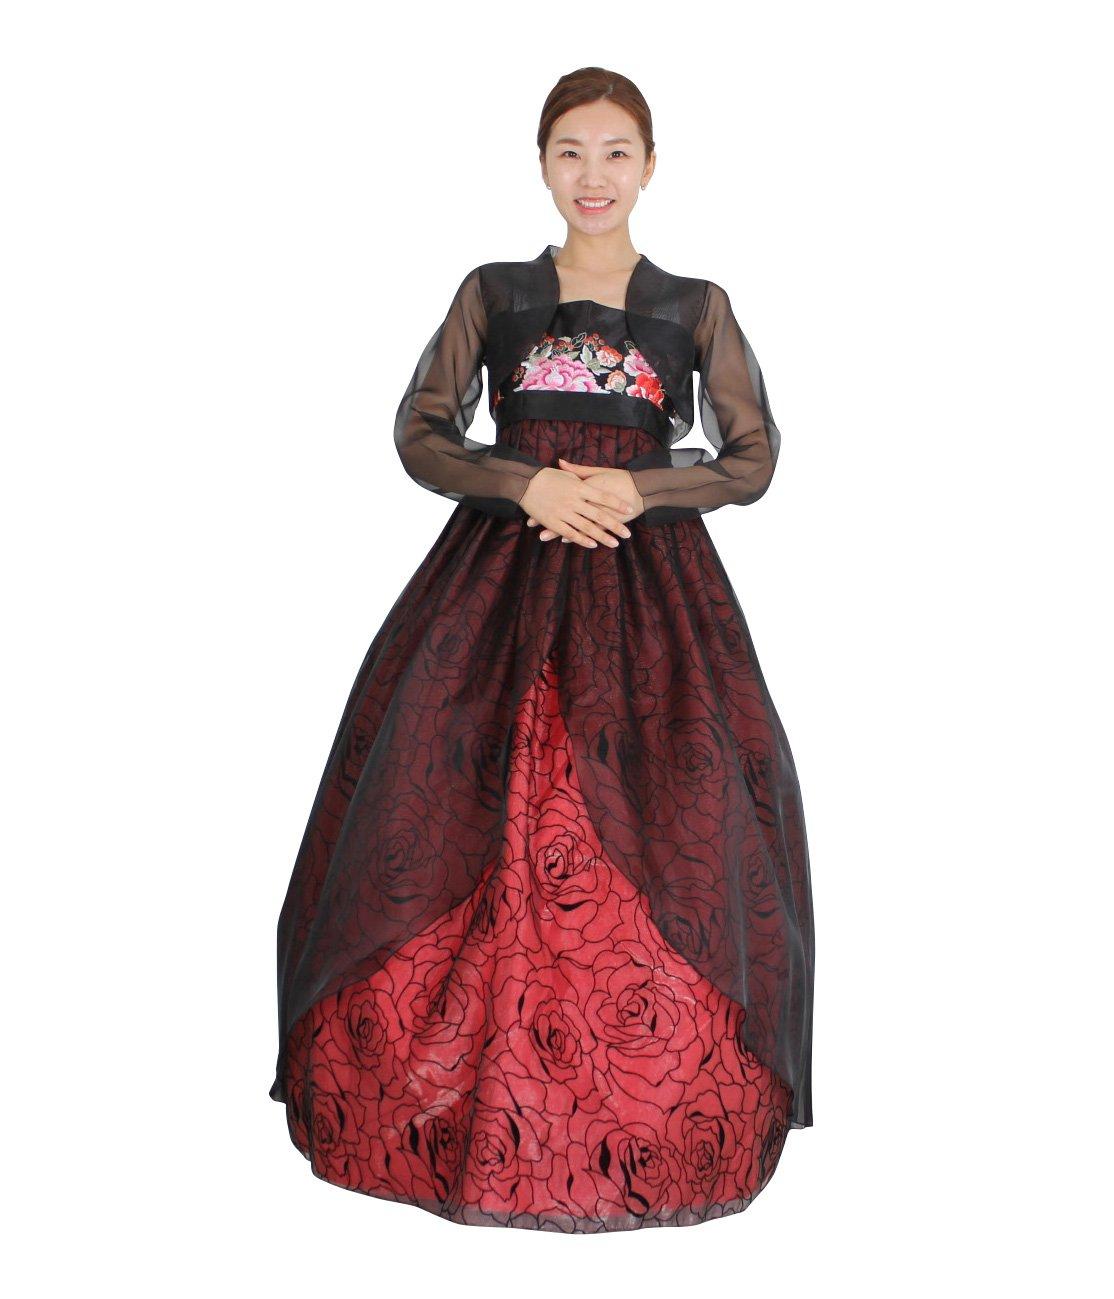 Hanbok Korea Traditional Costumes Women Junior Party Weddings Birthday Speical Ceremony co111 (skirt length 140cm (- 155cm)) by Hanbok store